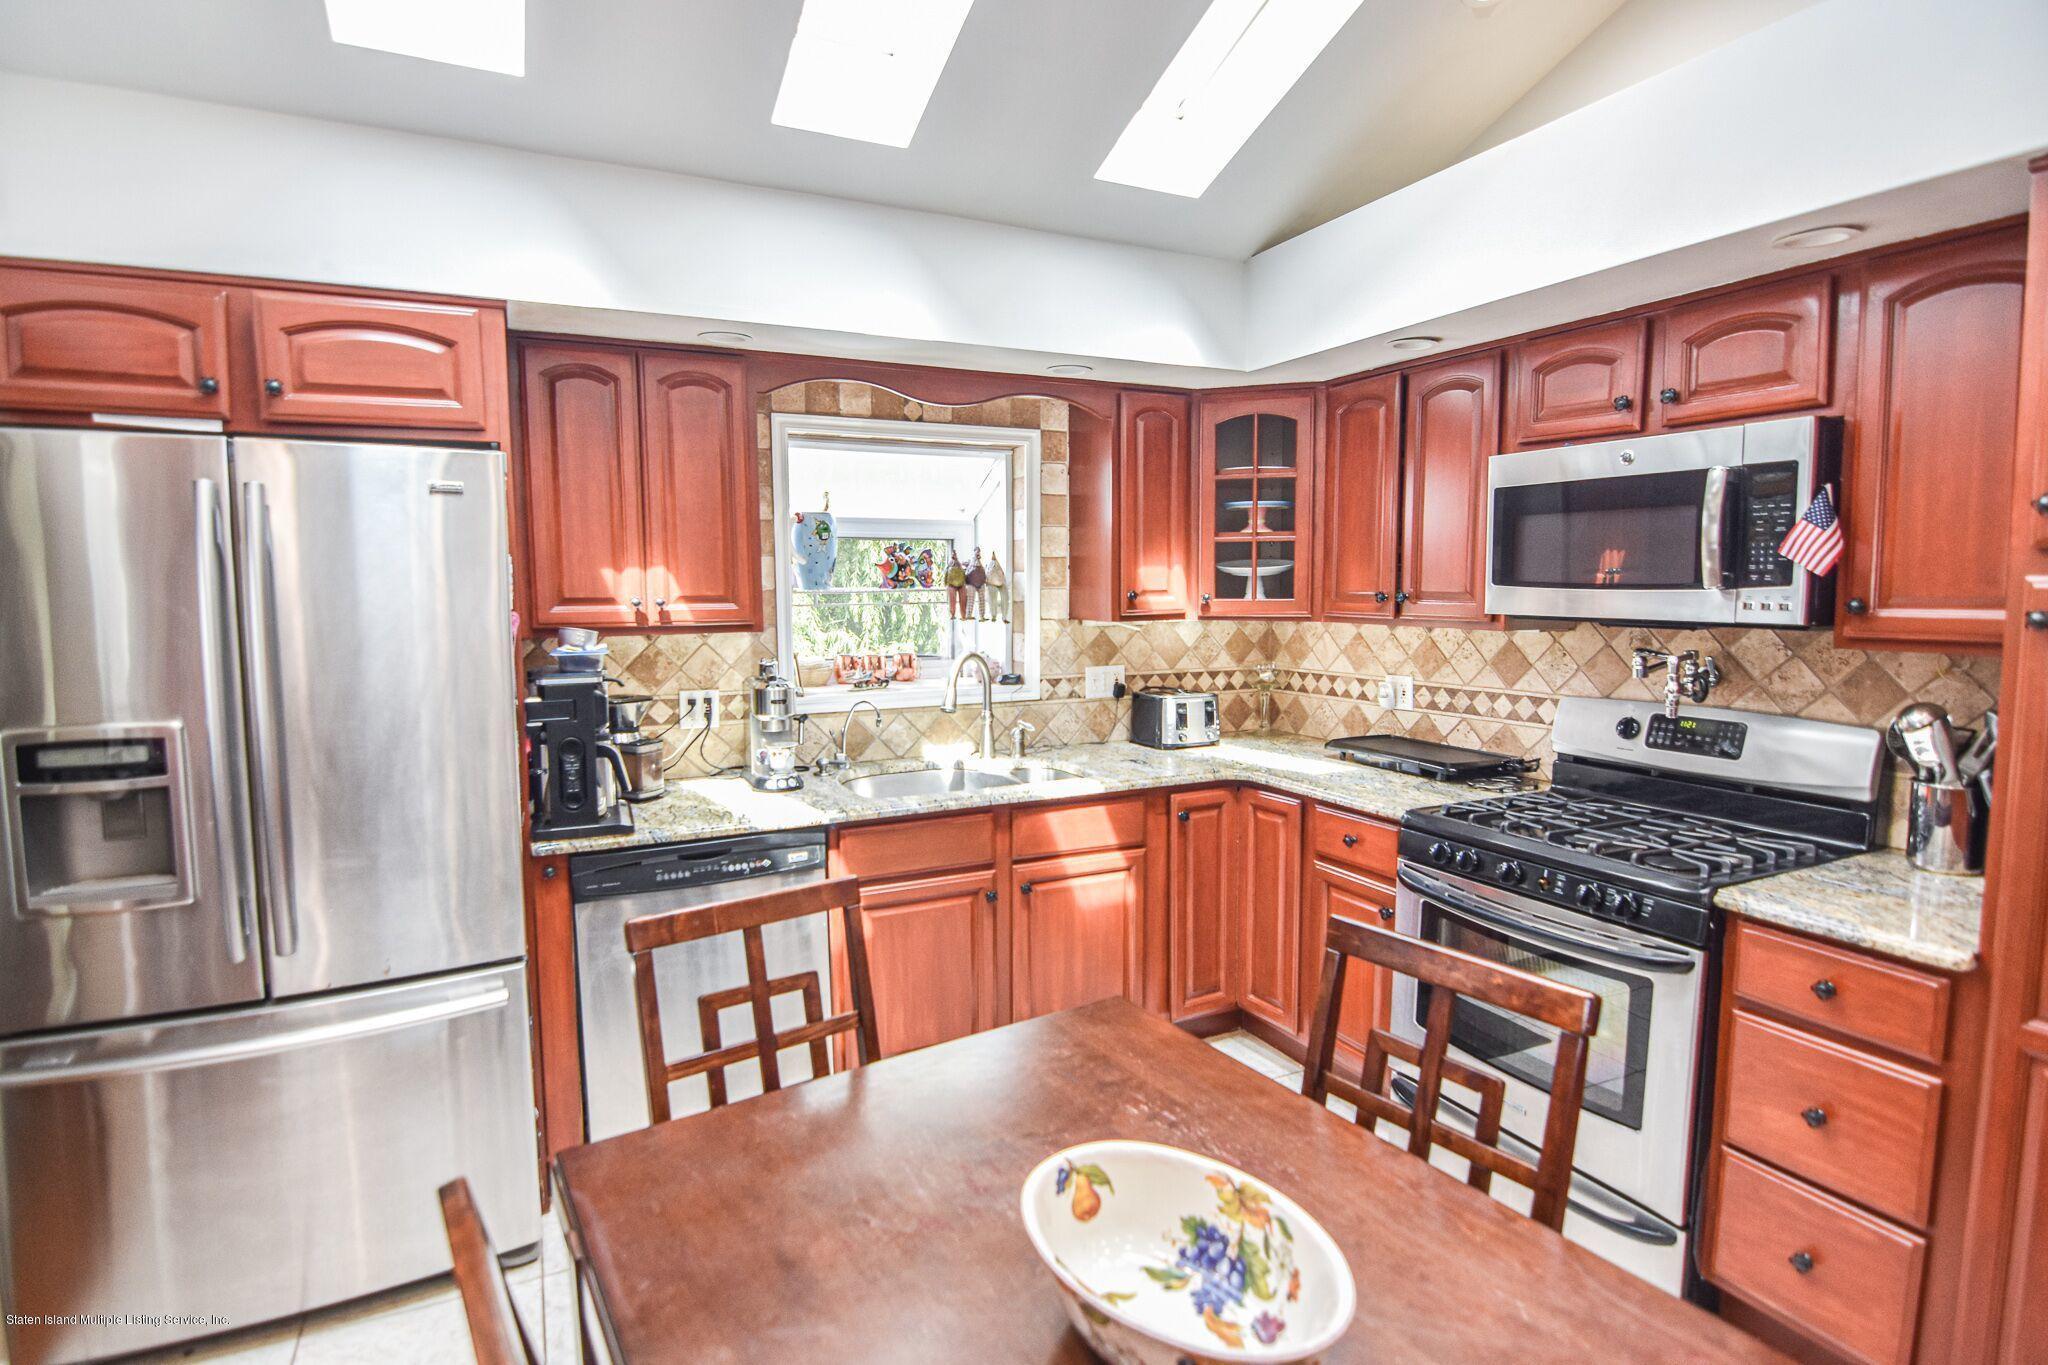 Two Family - Detached 3 Fieldstone Road  Staten Island, NY 10314, MLS-1131141-6